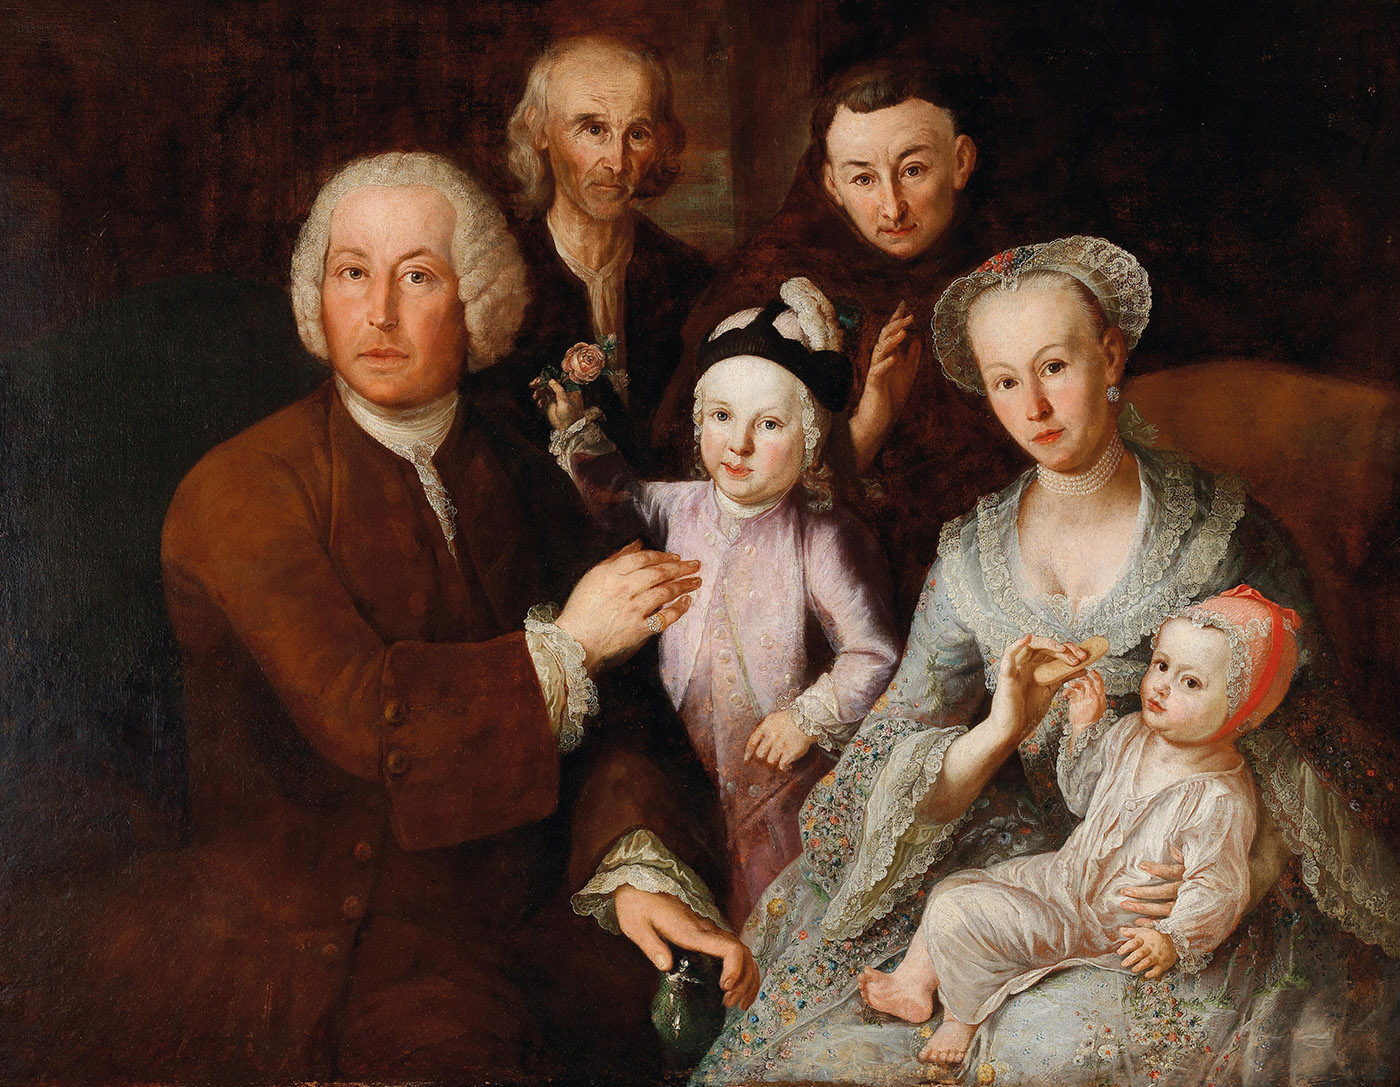 Anónimo. Retrato familiar.Escuela alemana. Siglo XVIII. Colección particular.